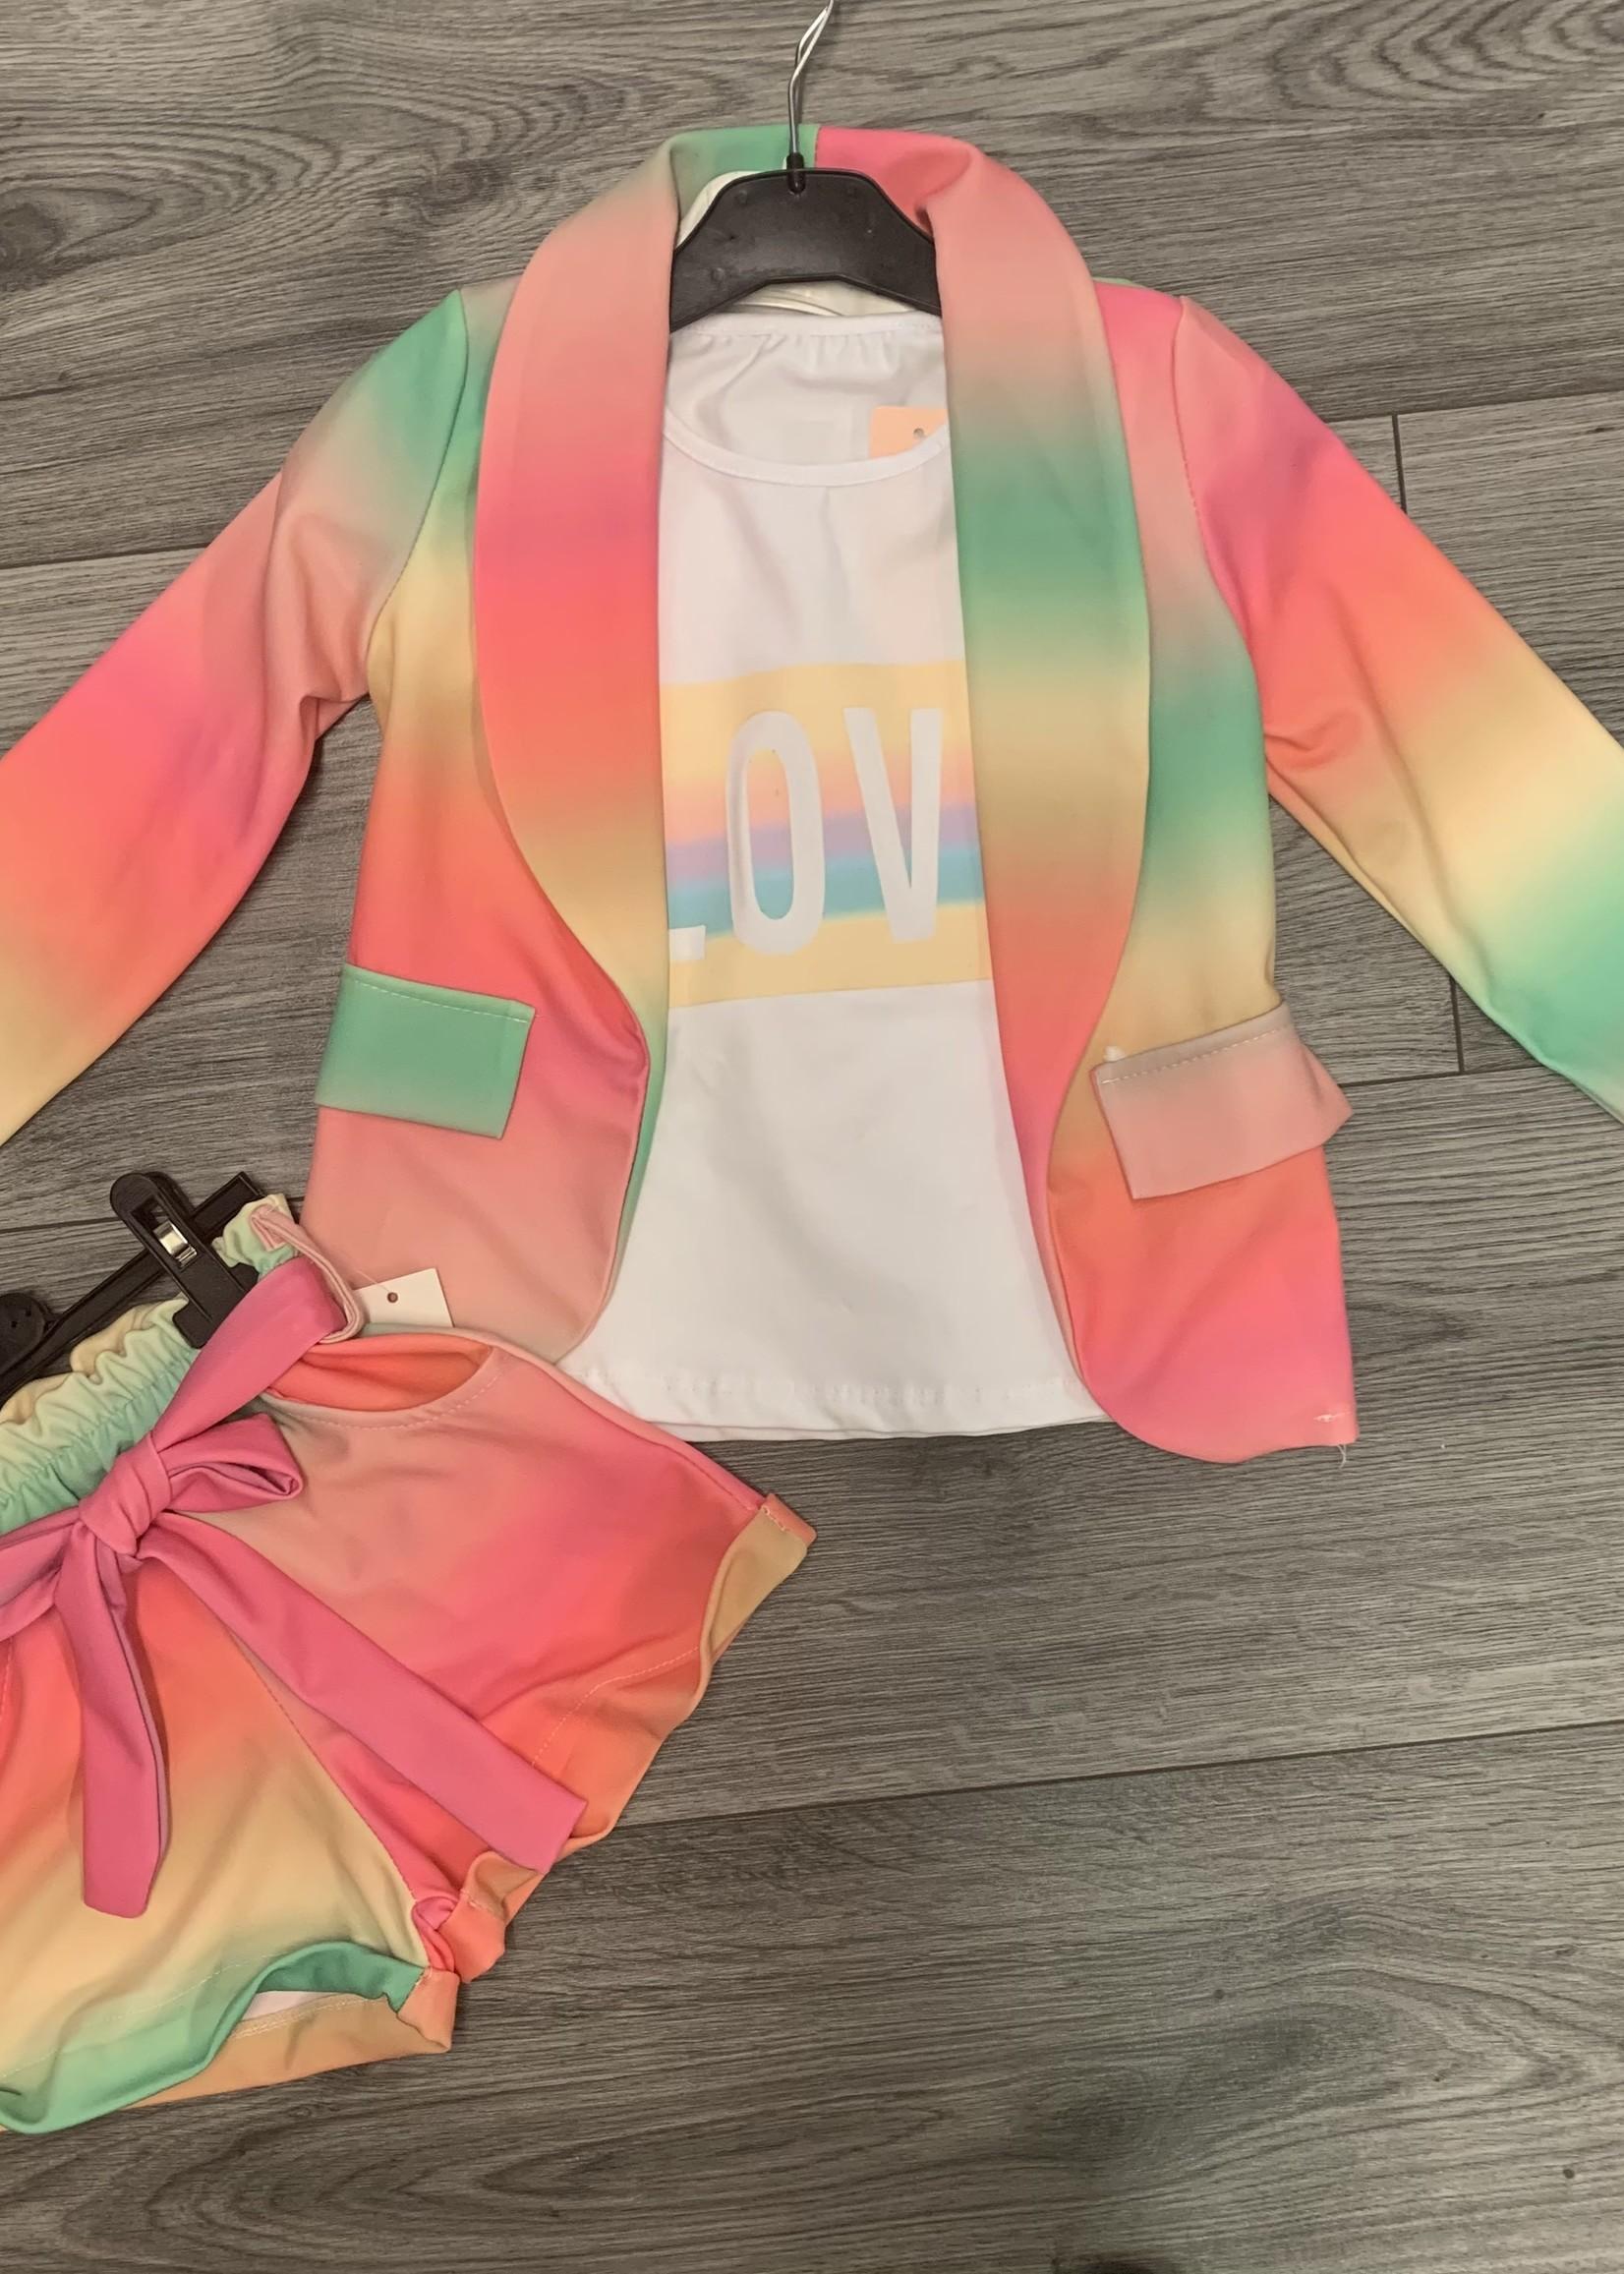 Divanis Divanis 3 delig rainbow set roze